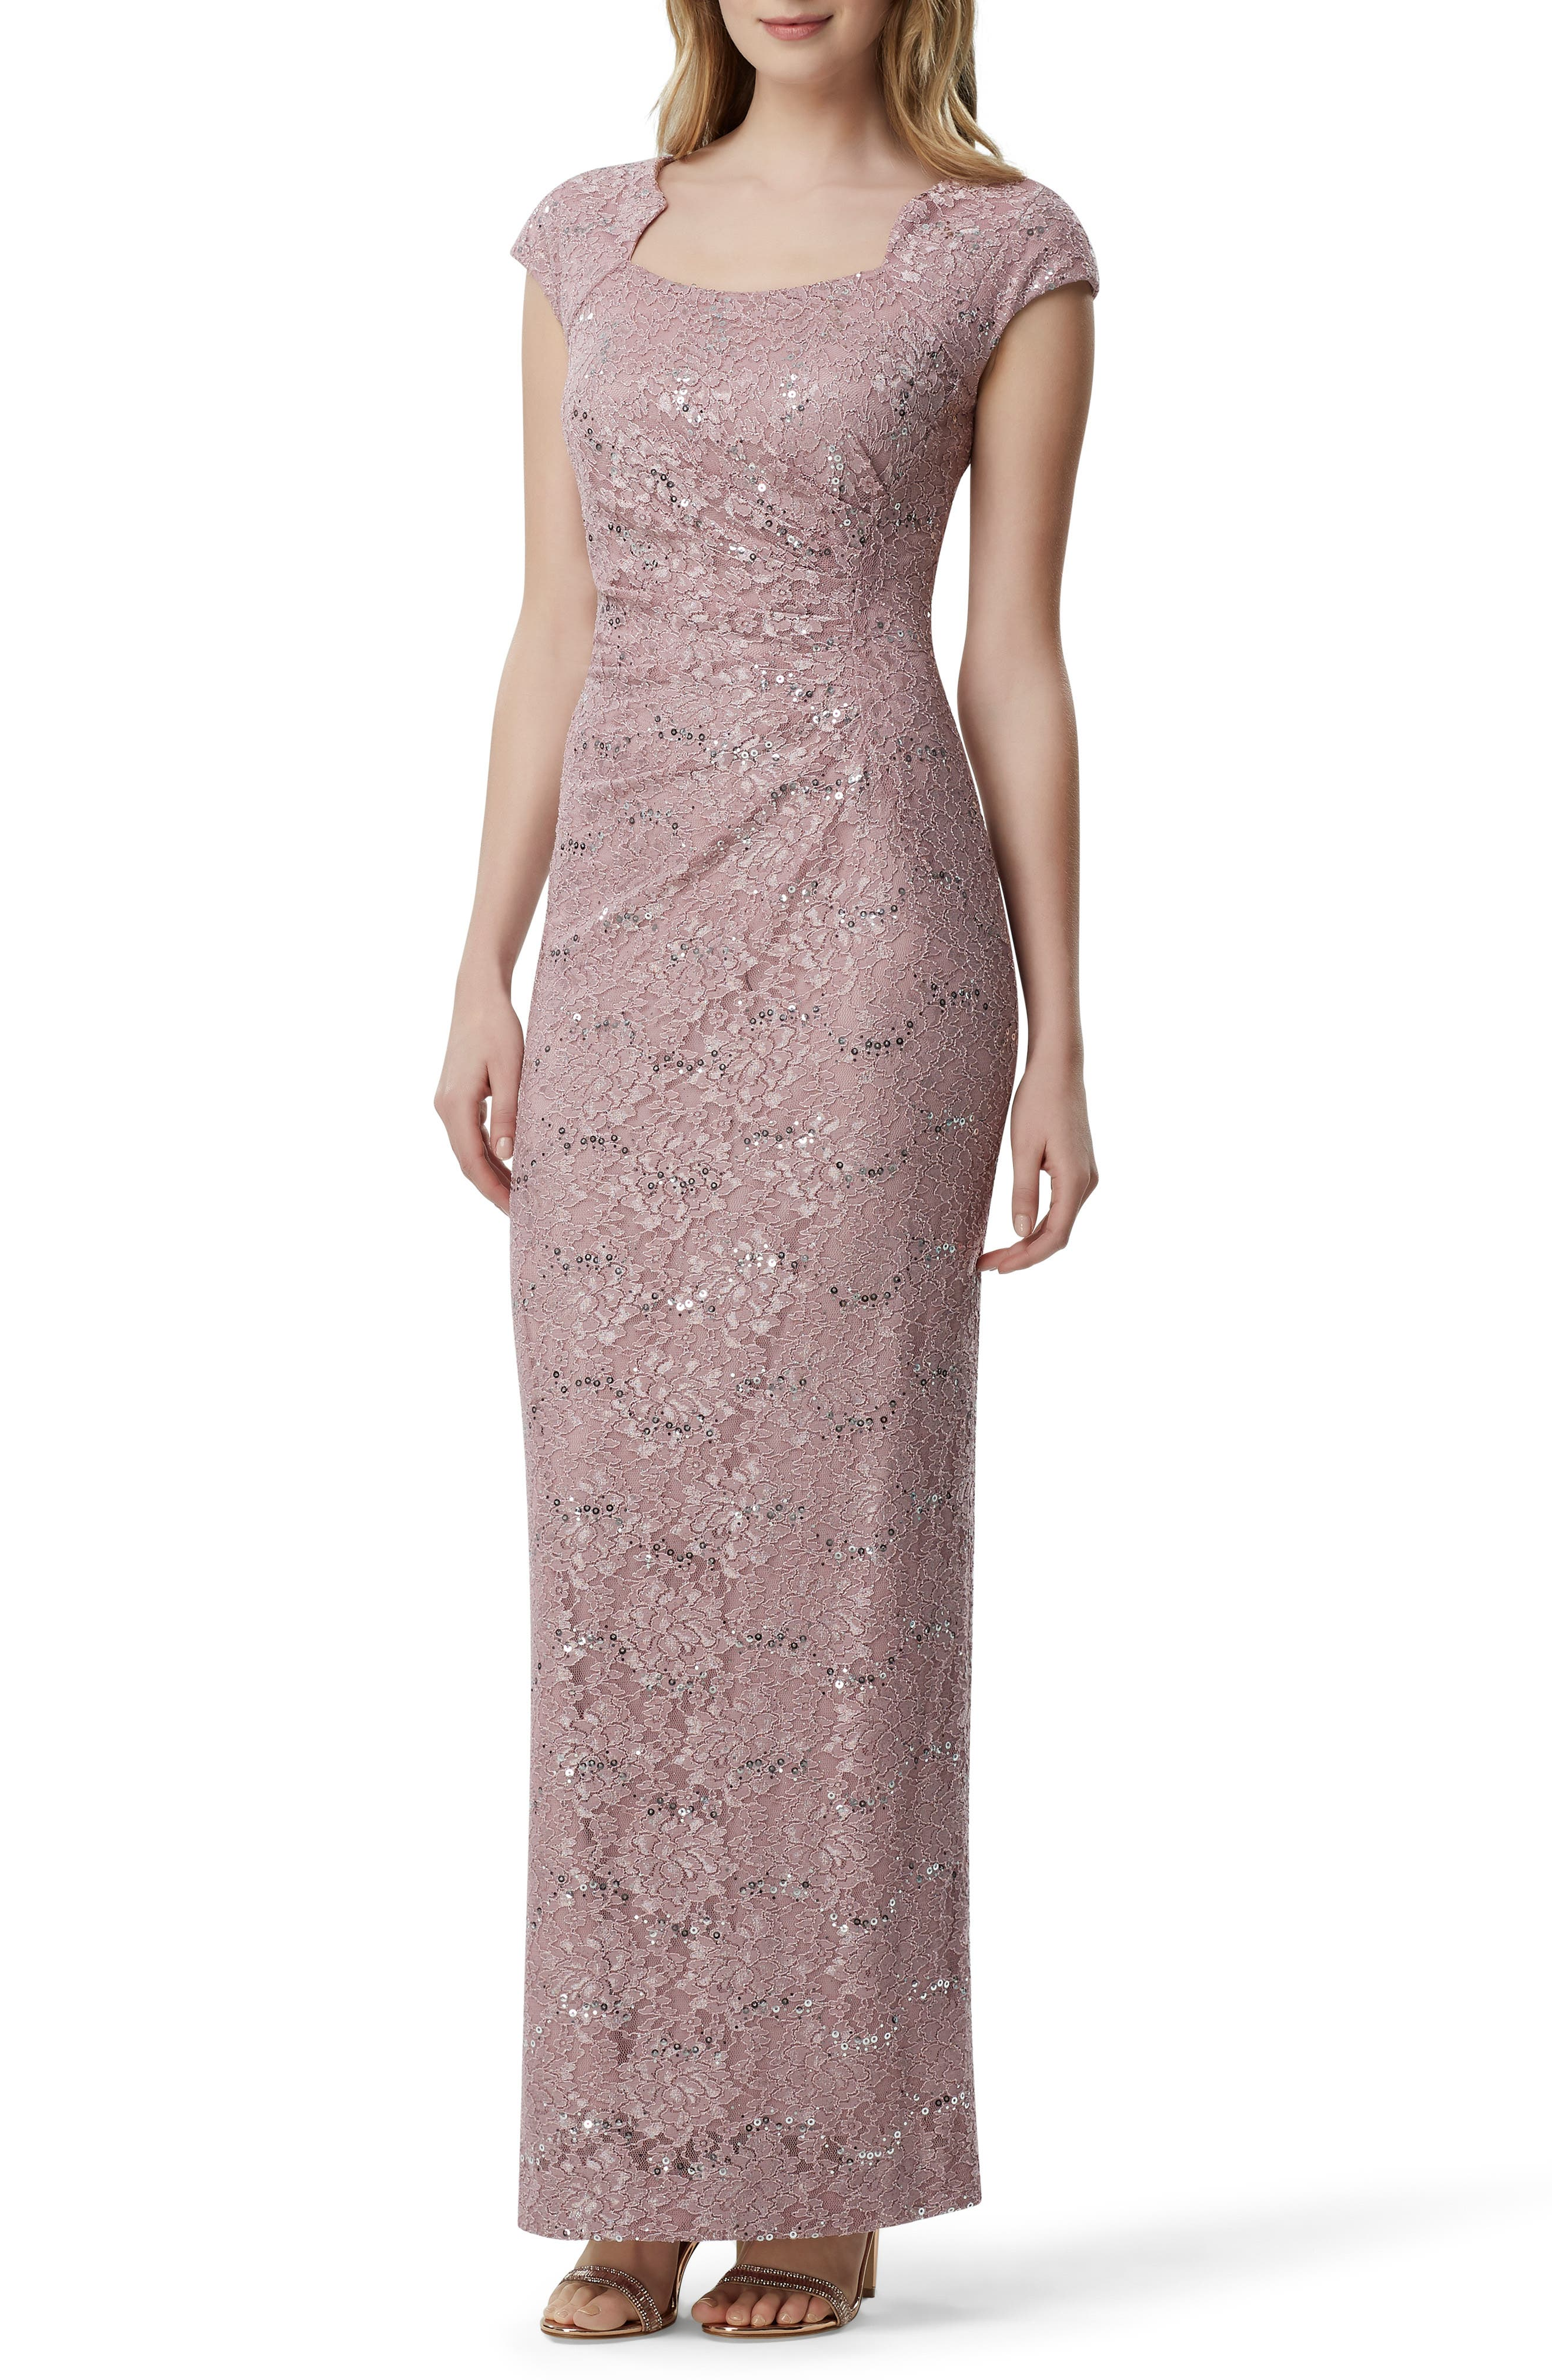 Tahari Sequin Embellished Evening Gown, Pink